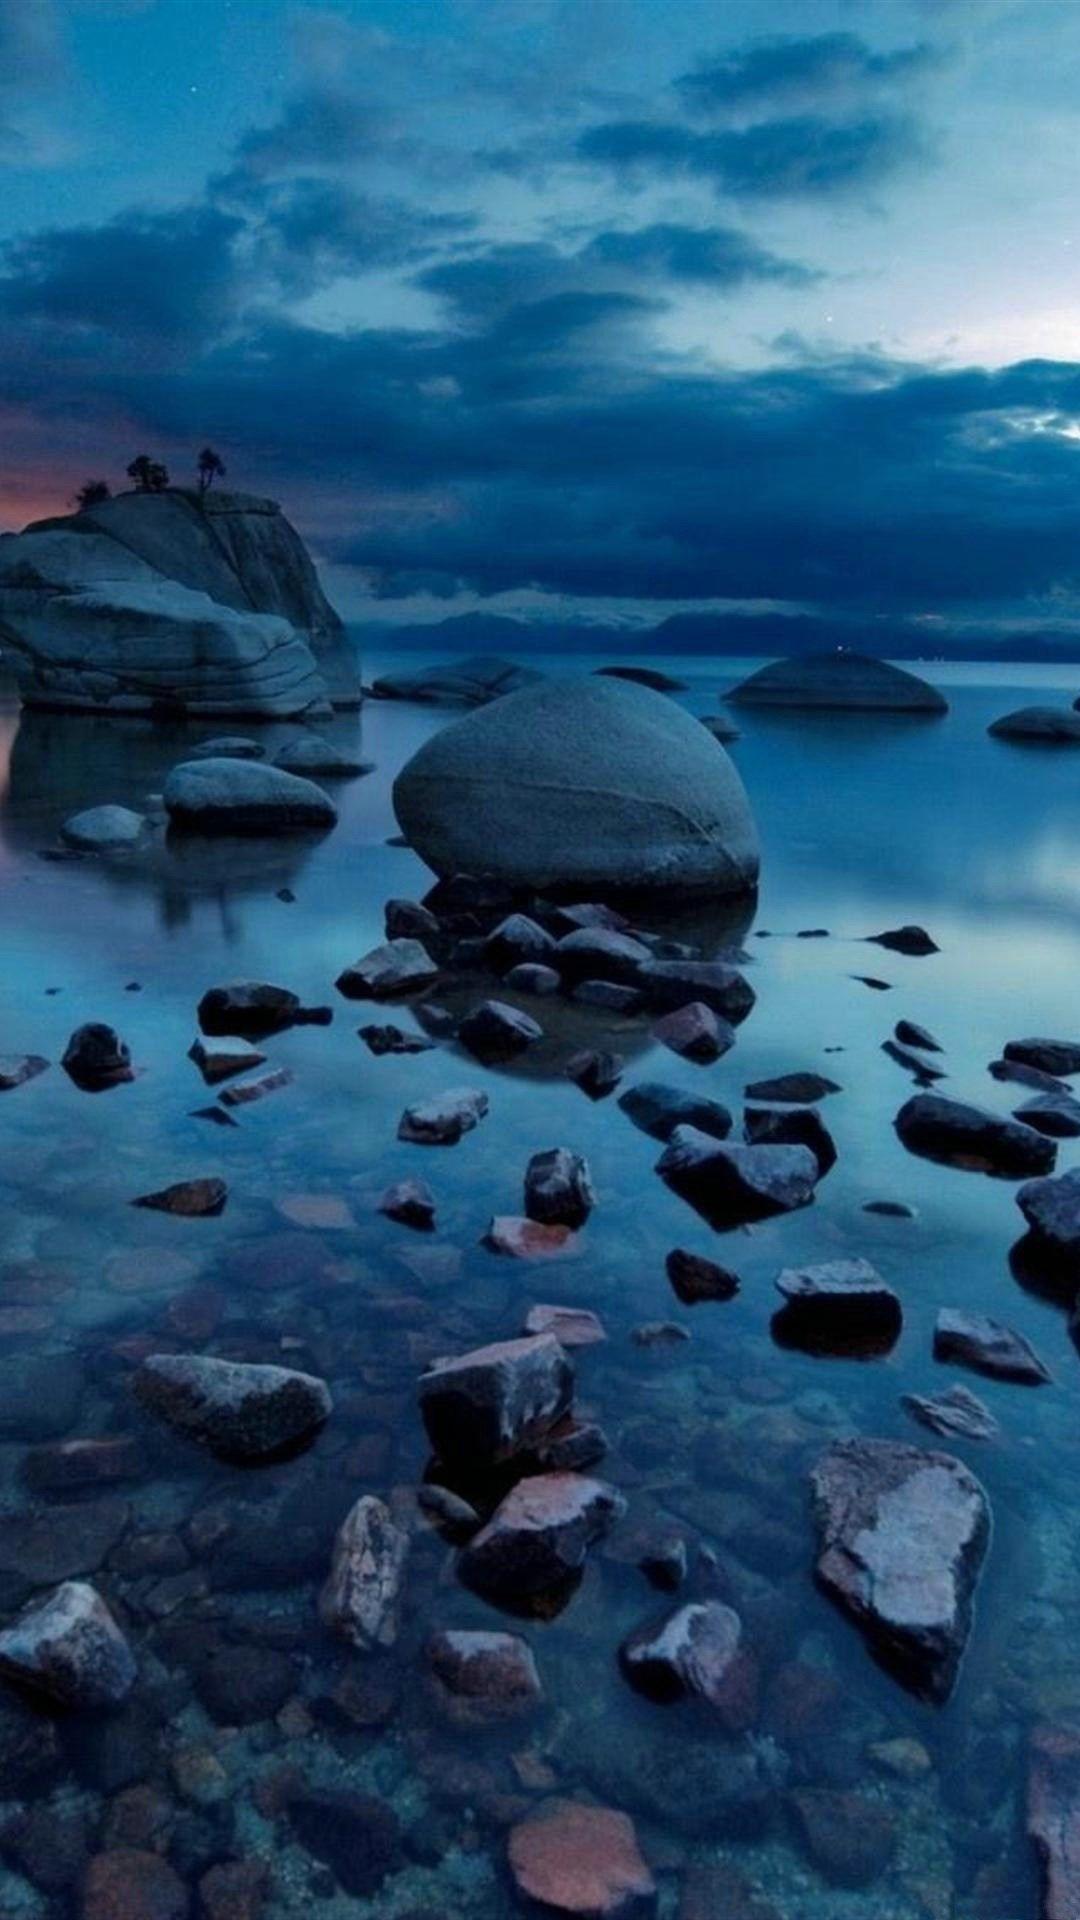 lake suset 1080 x 1920 wallpaper vertical | ololoshenka | Pinterest | Hd phone wallpapers, 1080p ...